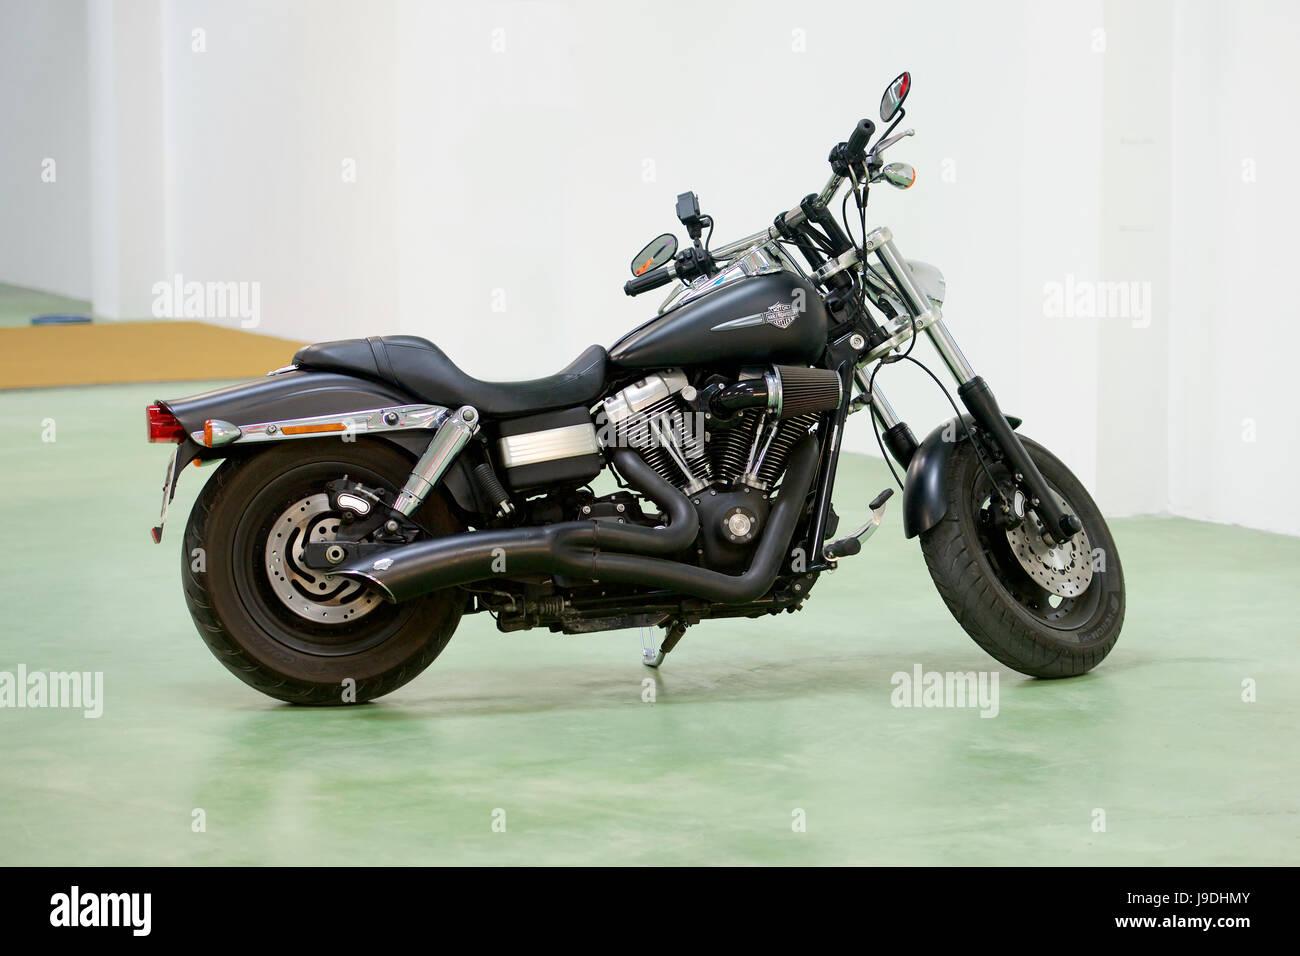 Harley Davidson FXDF Fat Bob Motorcycle - Stock Image